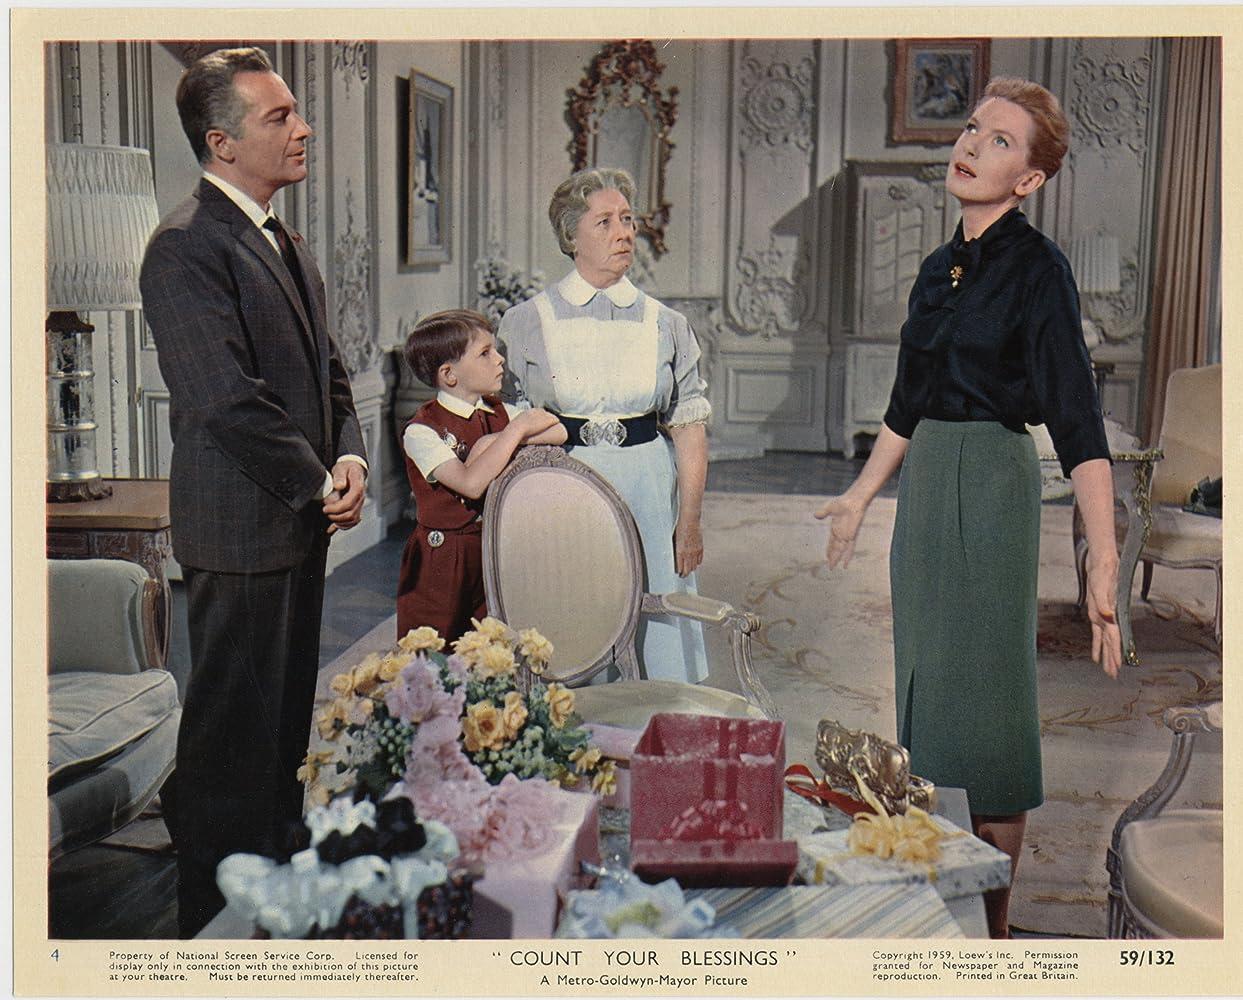 Rosemary Leach (1935?017),Lydia Reed Sex movies Franca Valeri,Meredith Baxter